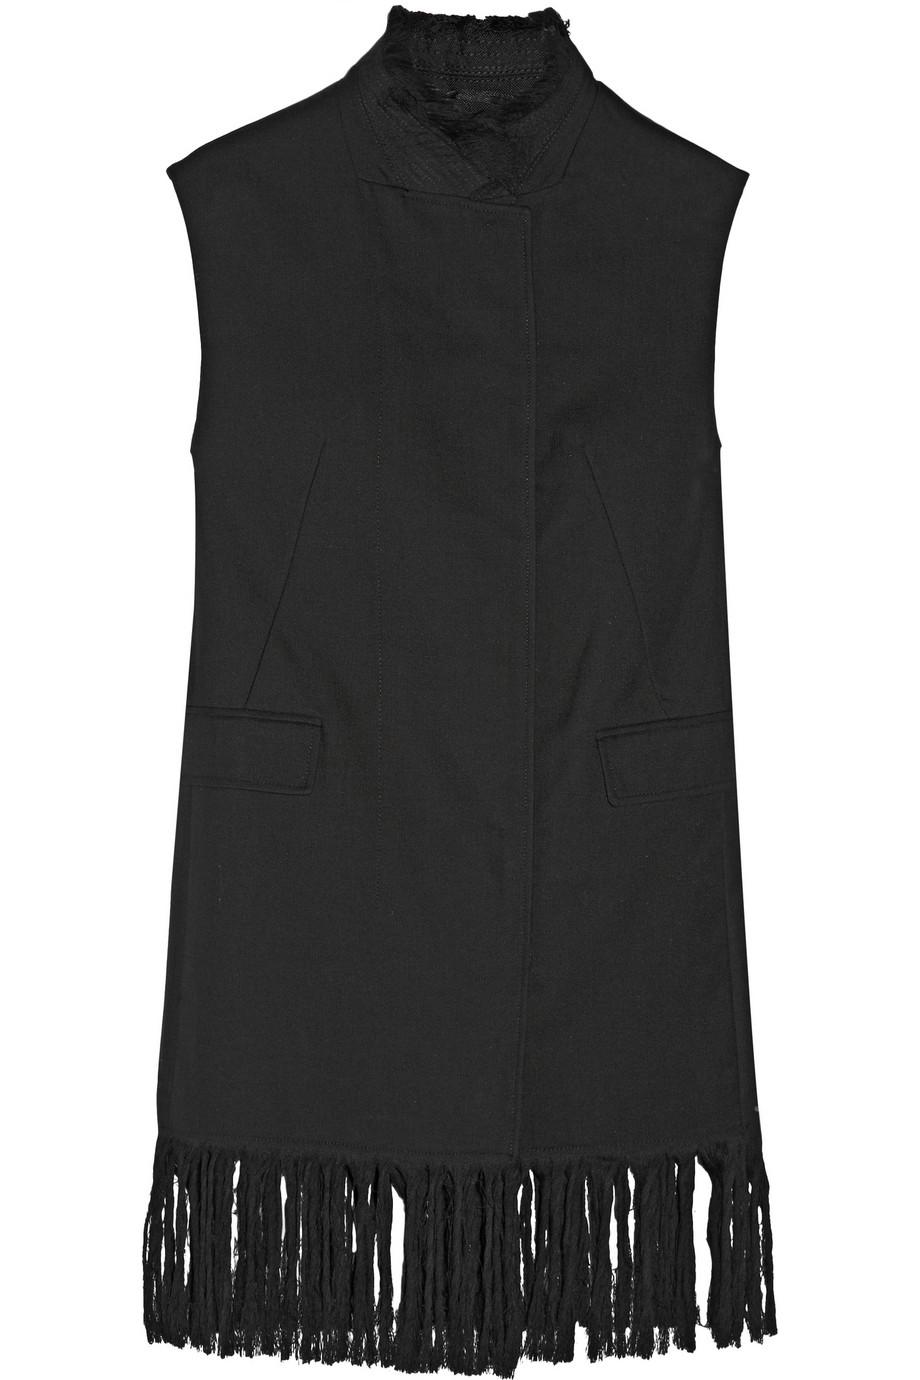 3.1 Phillip Lim Fringed Wool Vest